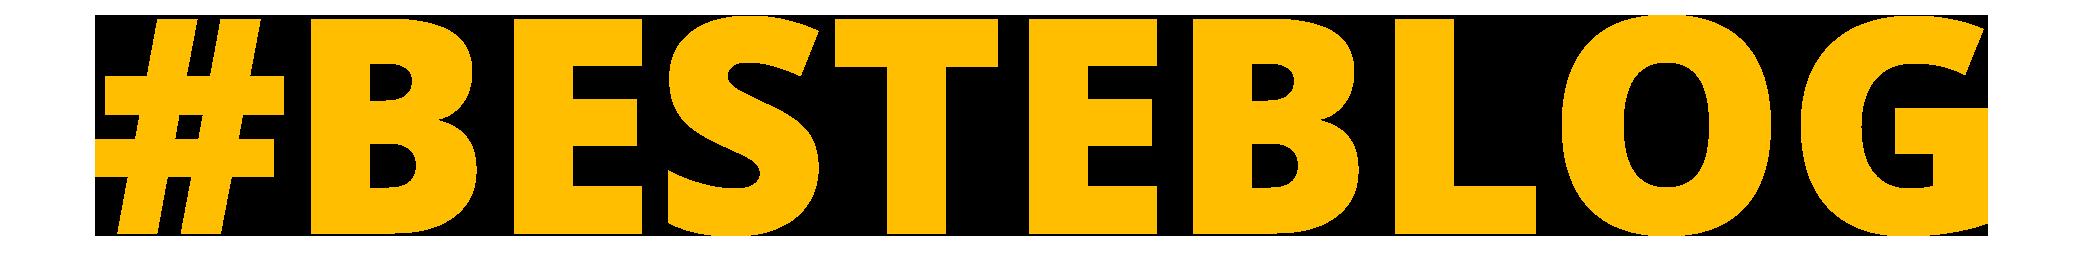 besteblog.de logo